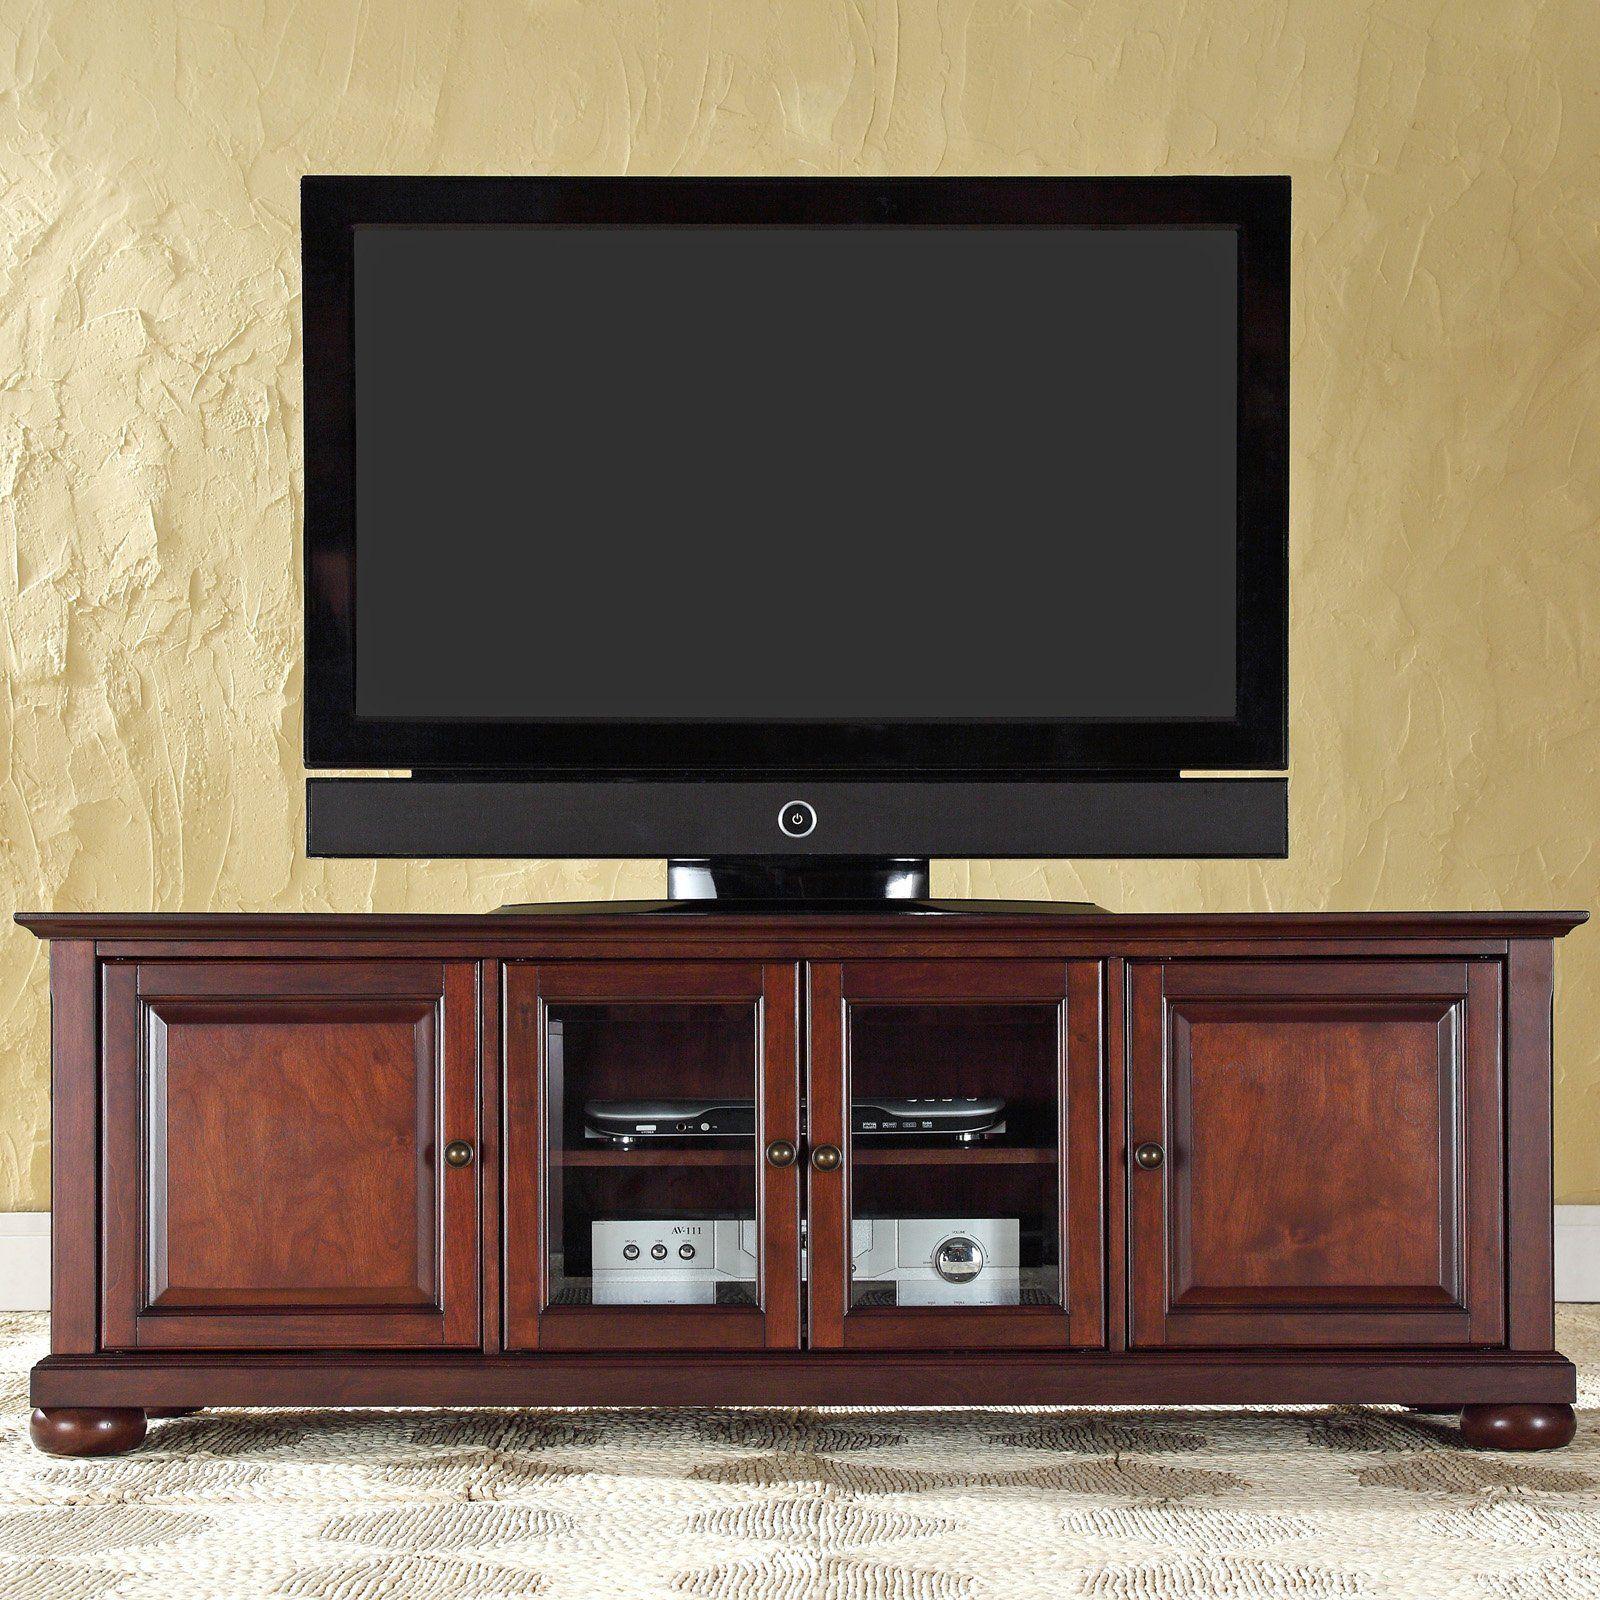 Have To Have It Crosley Alexandria 60 In Low Profile Tv Stand Vintage Mahogany 329 Hayneedle Com Low Profile Tv Stand Tv Stand 60 Tv Stand